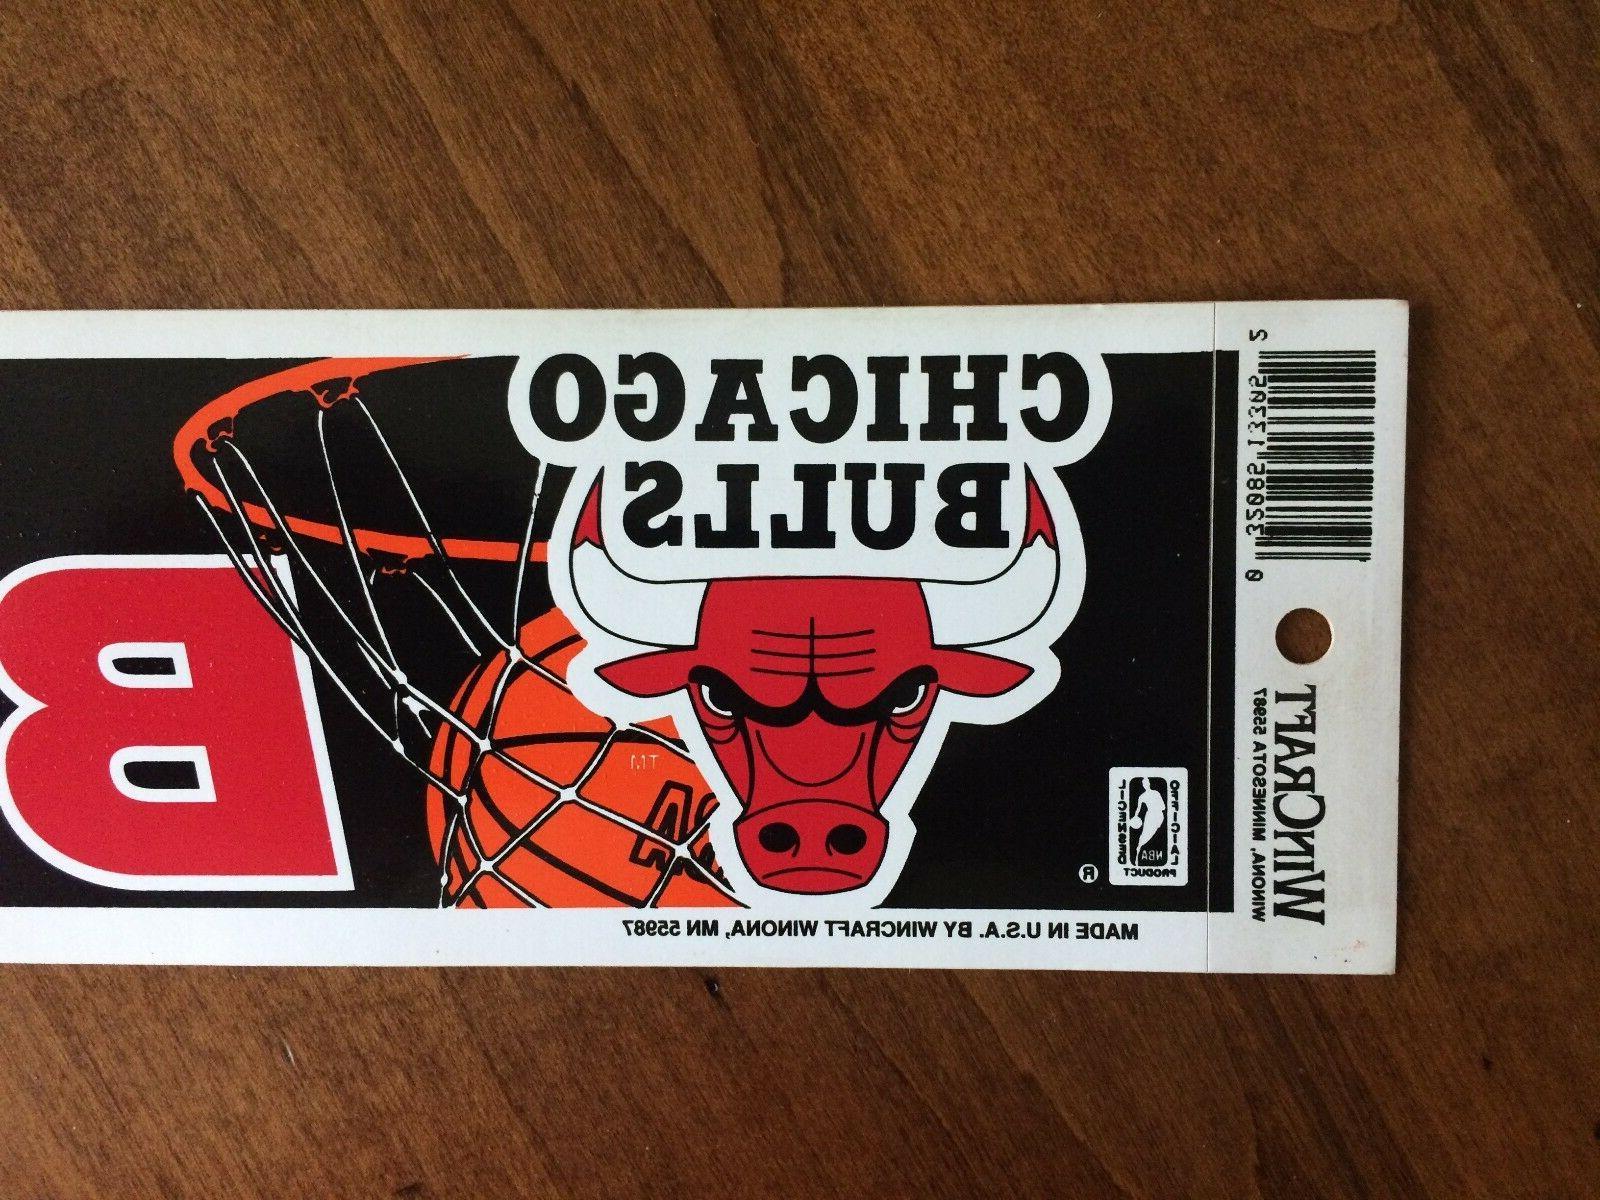 Vintage Chicago Bulls Bumper Stock NOS